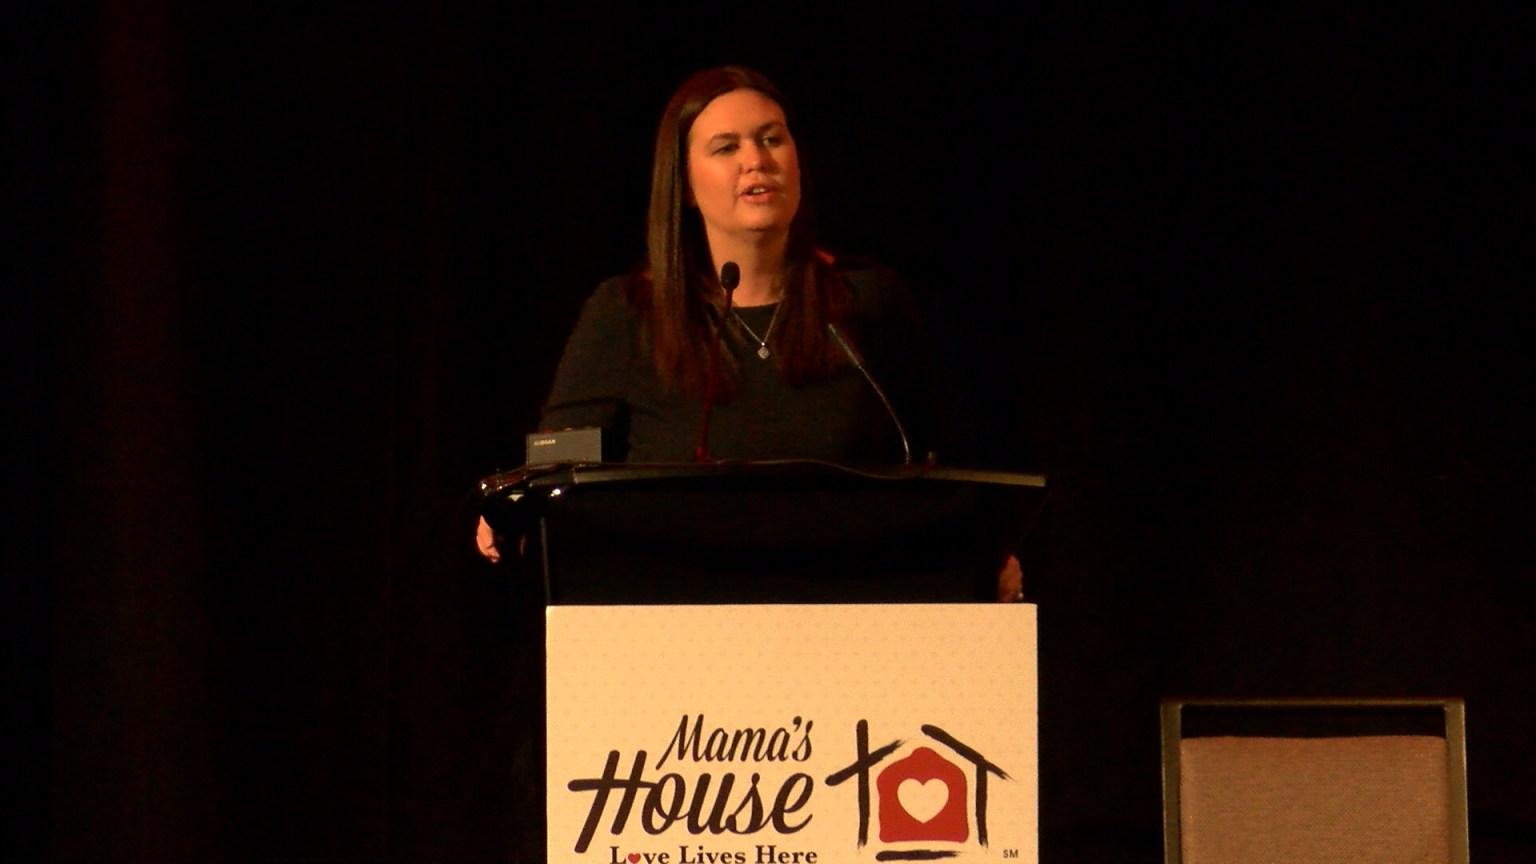 Sarah Huckabee Sanders, Featured Speaker at Mama's House Major Fundraiser